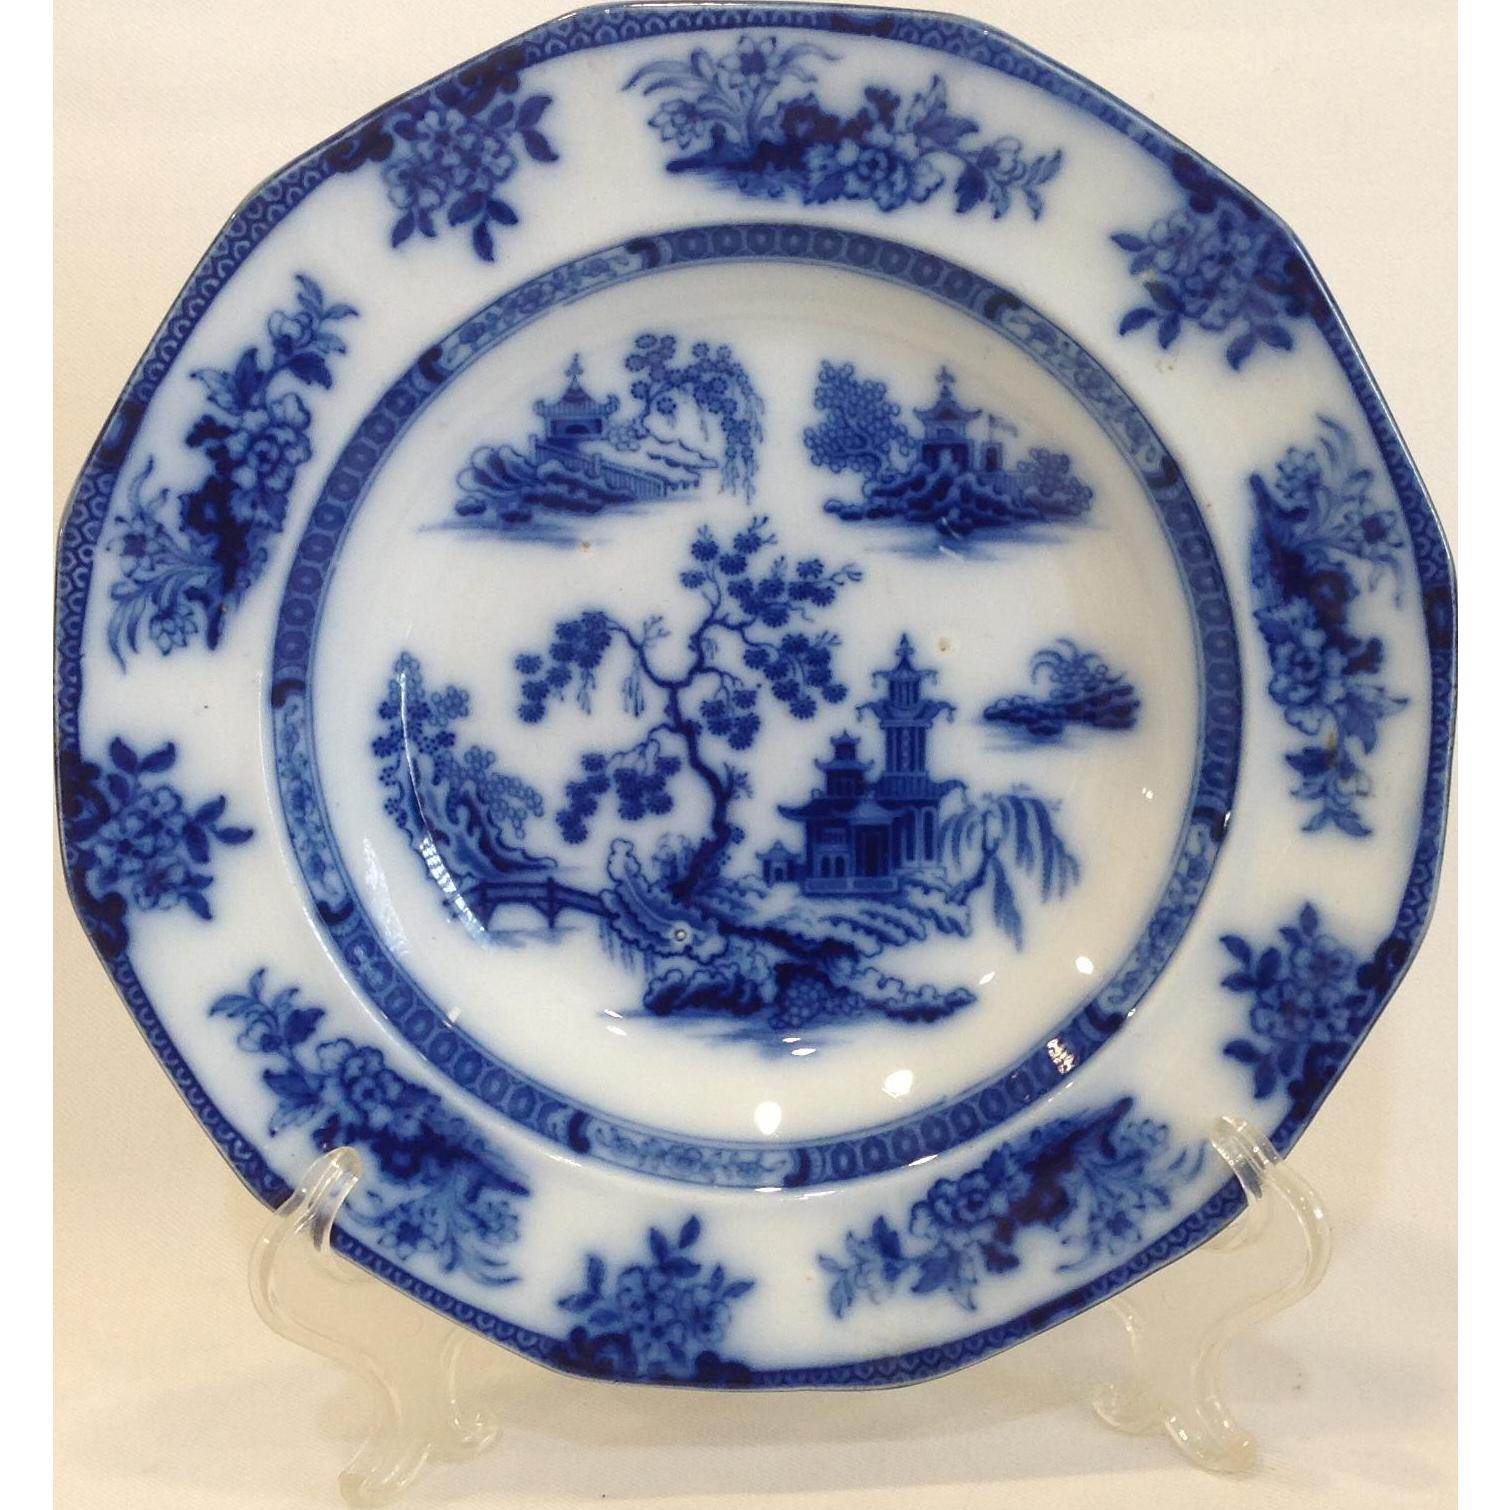 J Wedgwood Chapoo Flow Blue Rimmed Soup Plate c 1841-1860